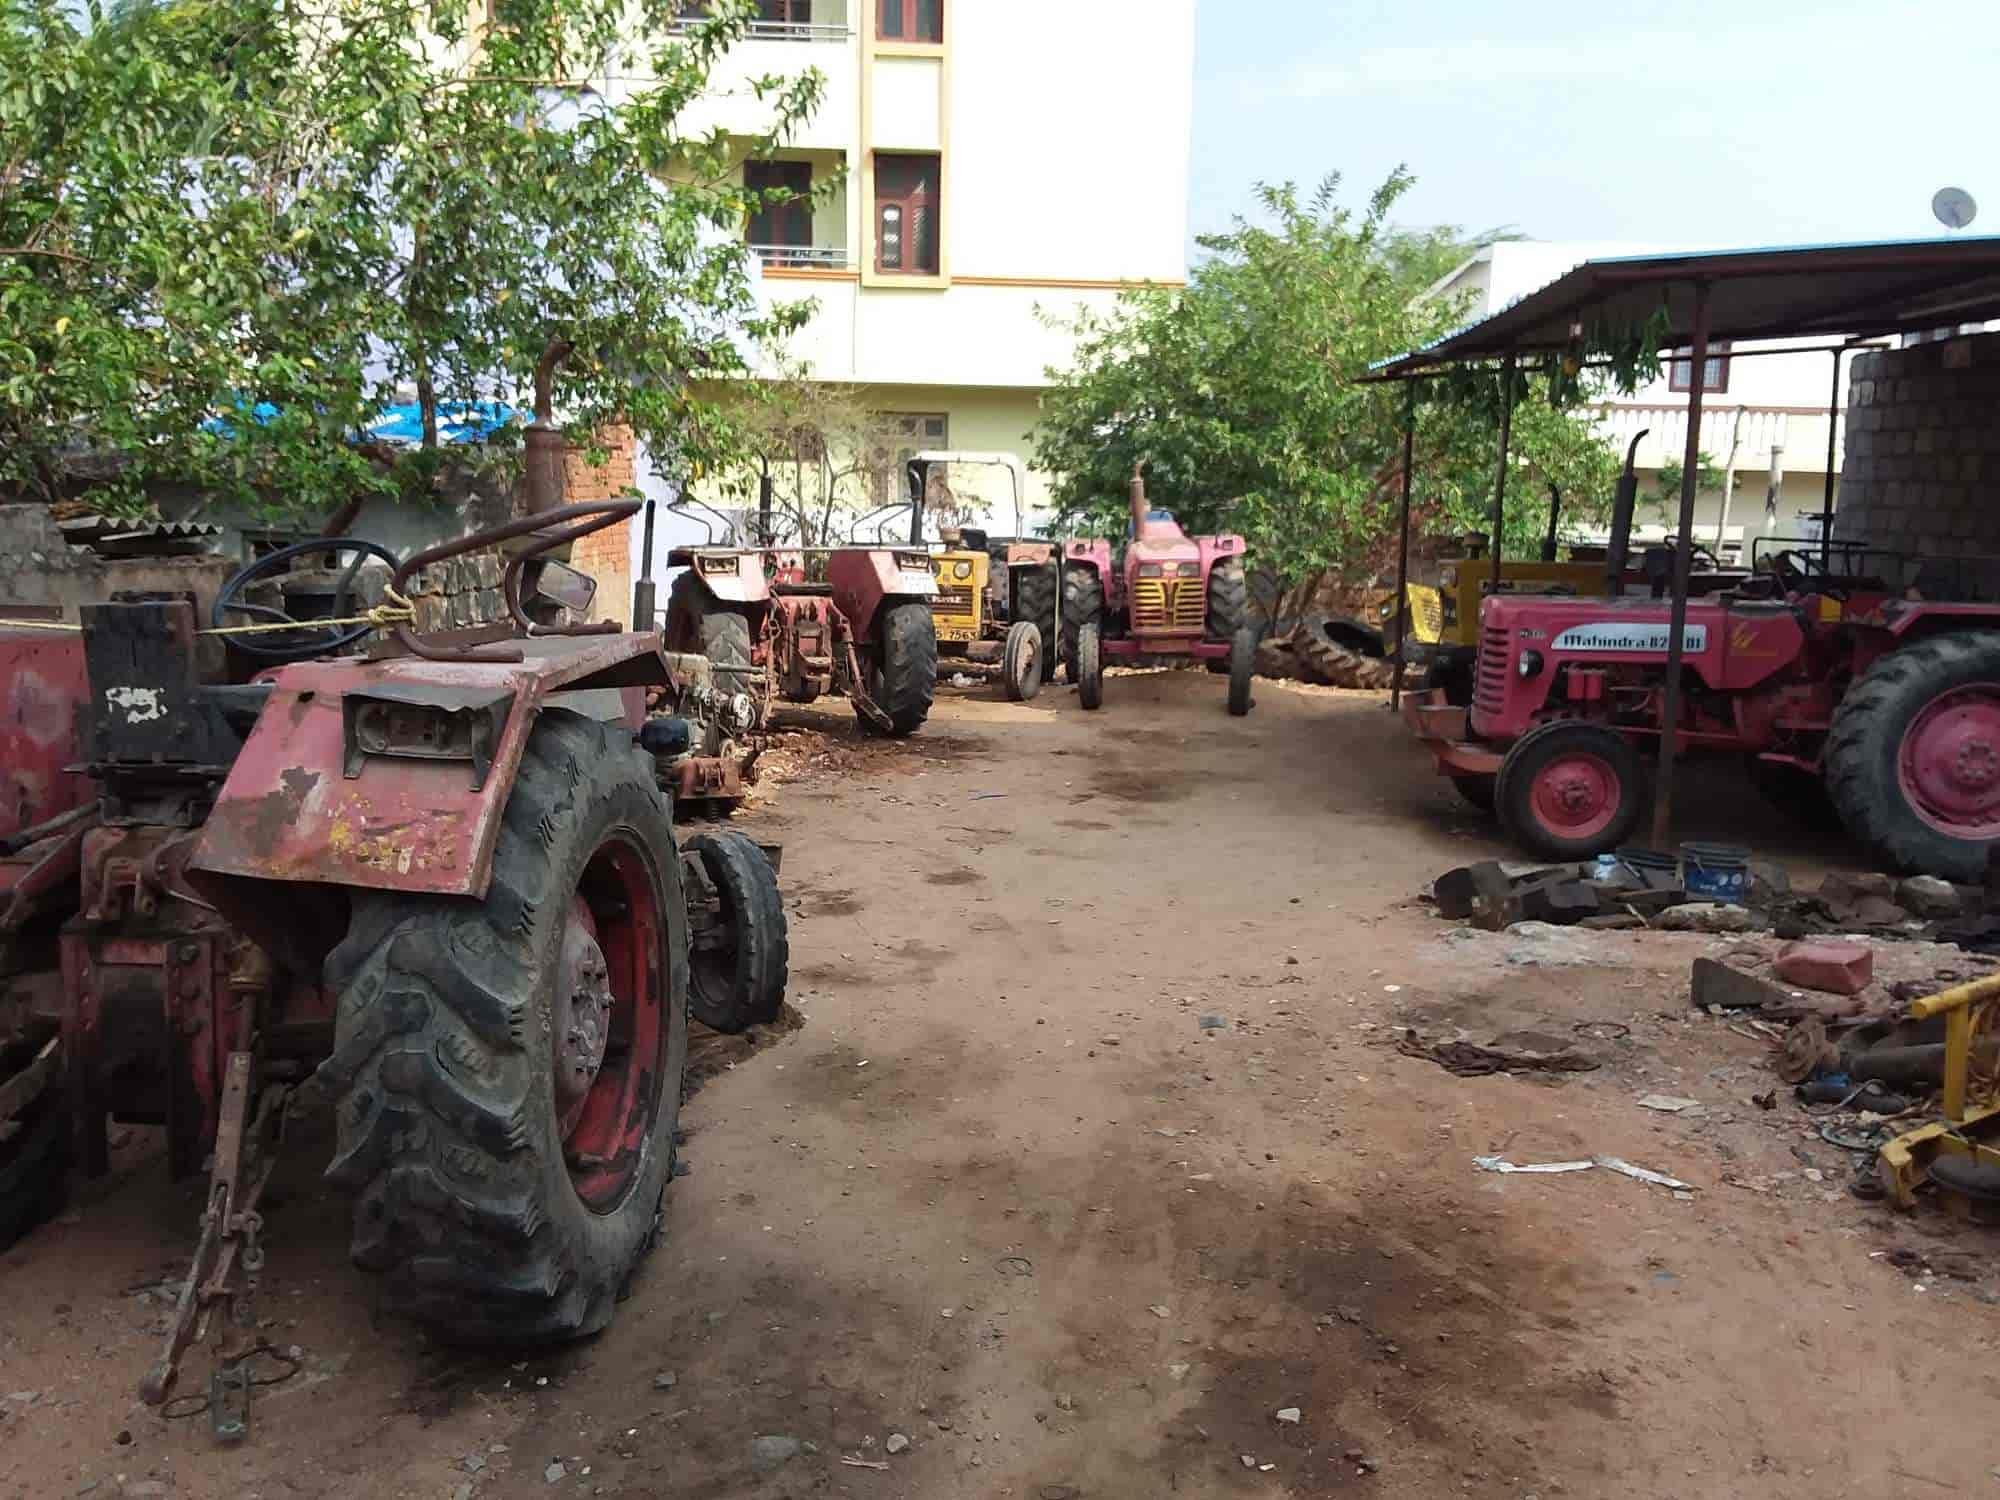 Kisan Tractor Disposal, AMBEDKARNAGAR - Second Hand Tractor